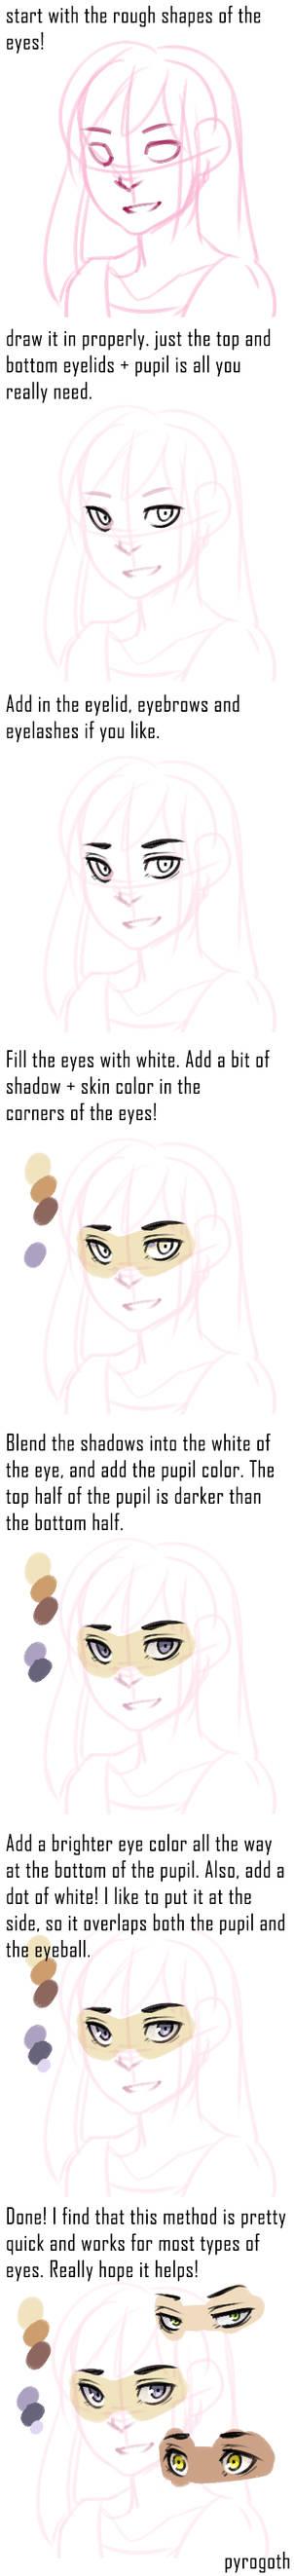 Tutorial: Super quick eye colors